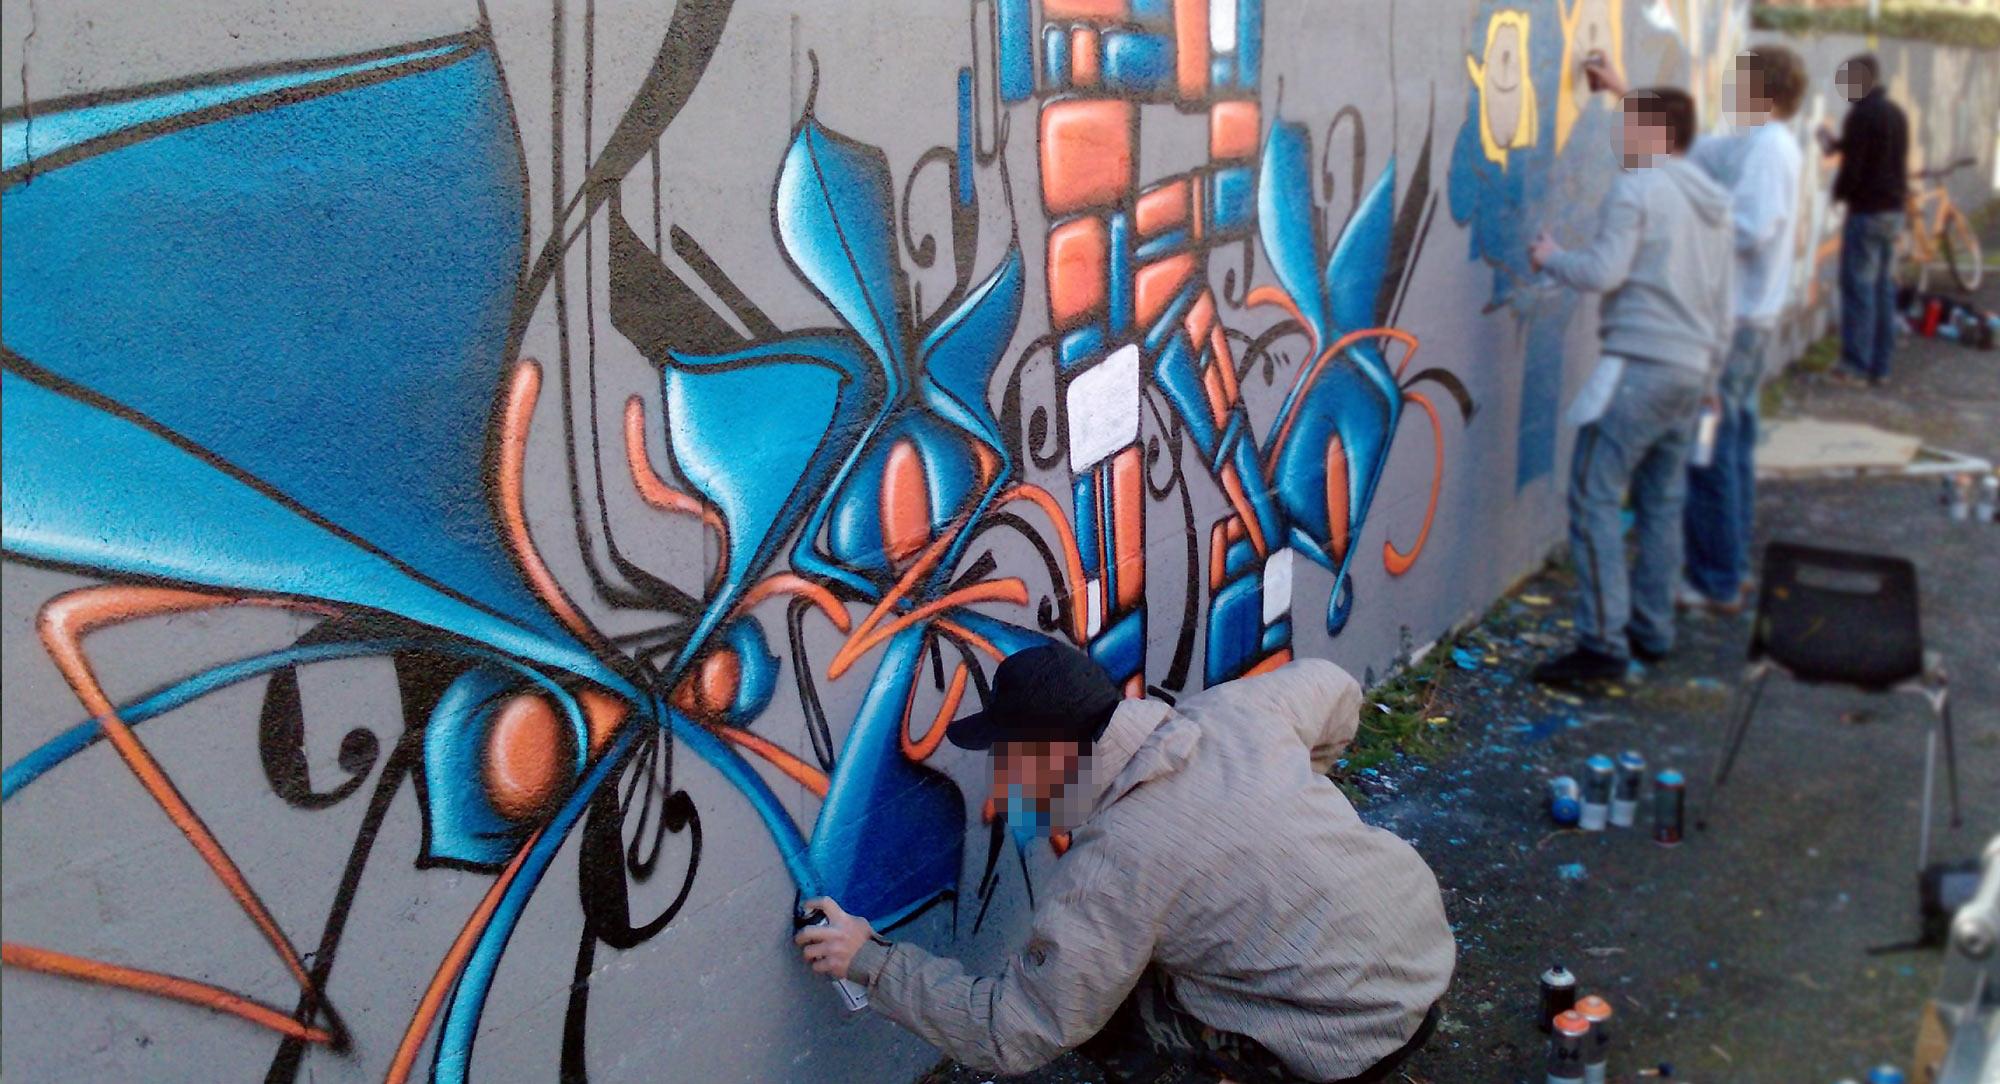 Waro - Graffiti - ENSACF - Clermont-Ferrand